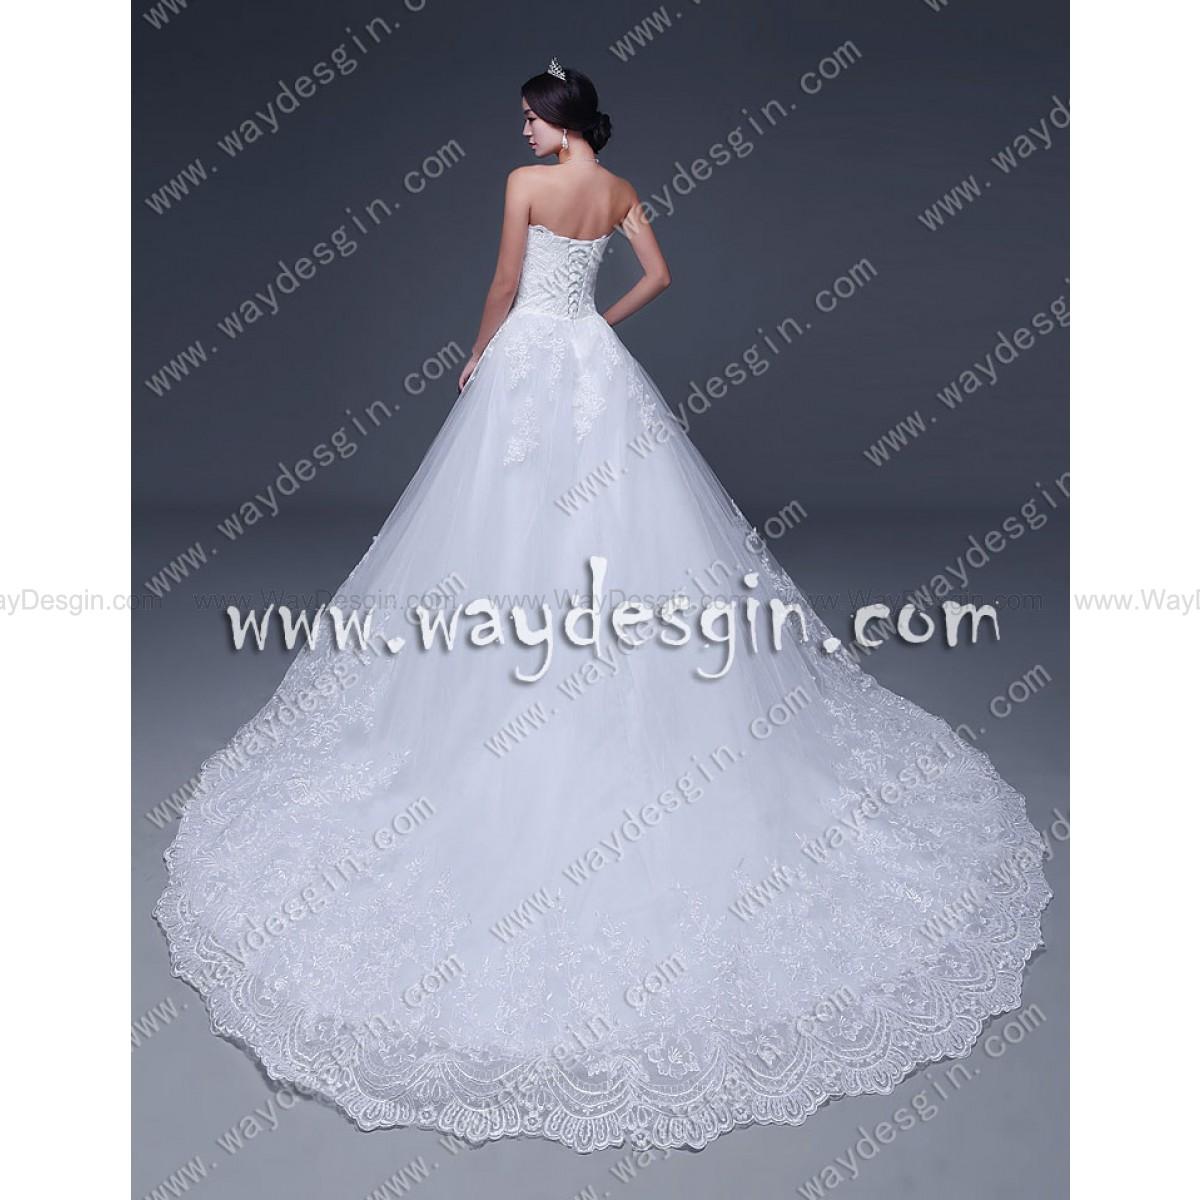 Elegant A-line Strapless Applique Court Train Sleeveless Wedding Dress